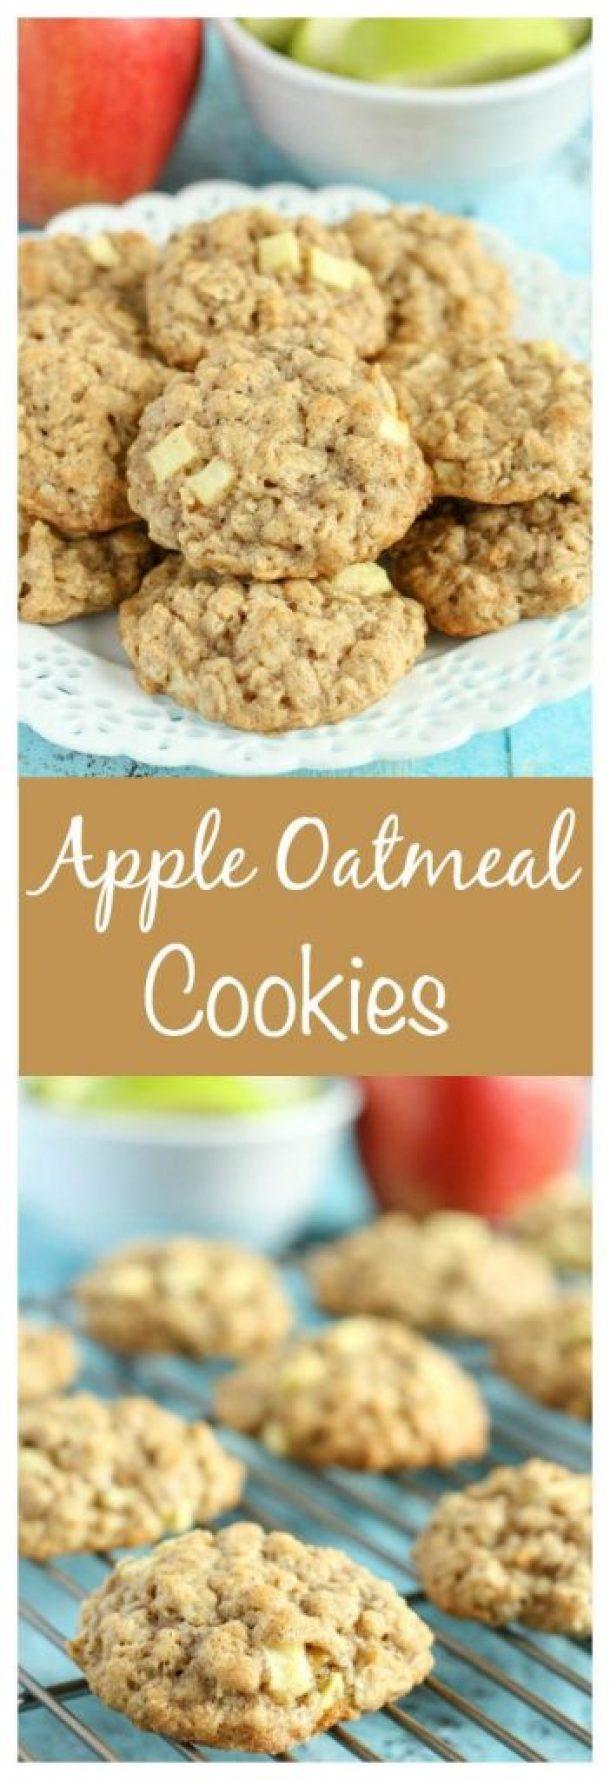 Apple Oatmeal Cookies Recipe | Live Well Bake Often - Apple Recipes